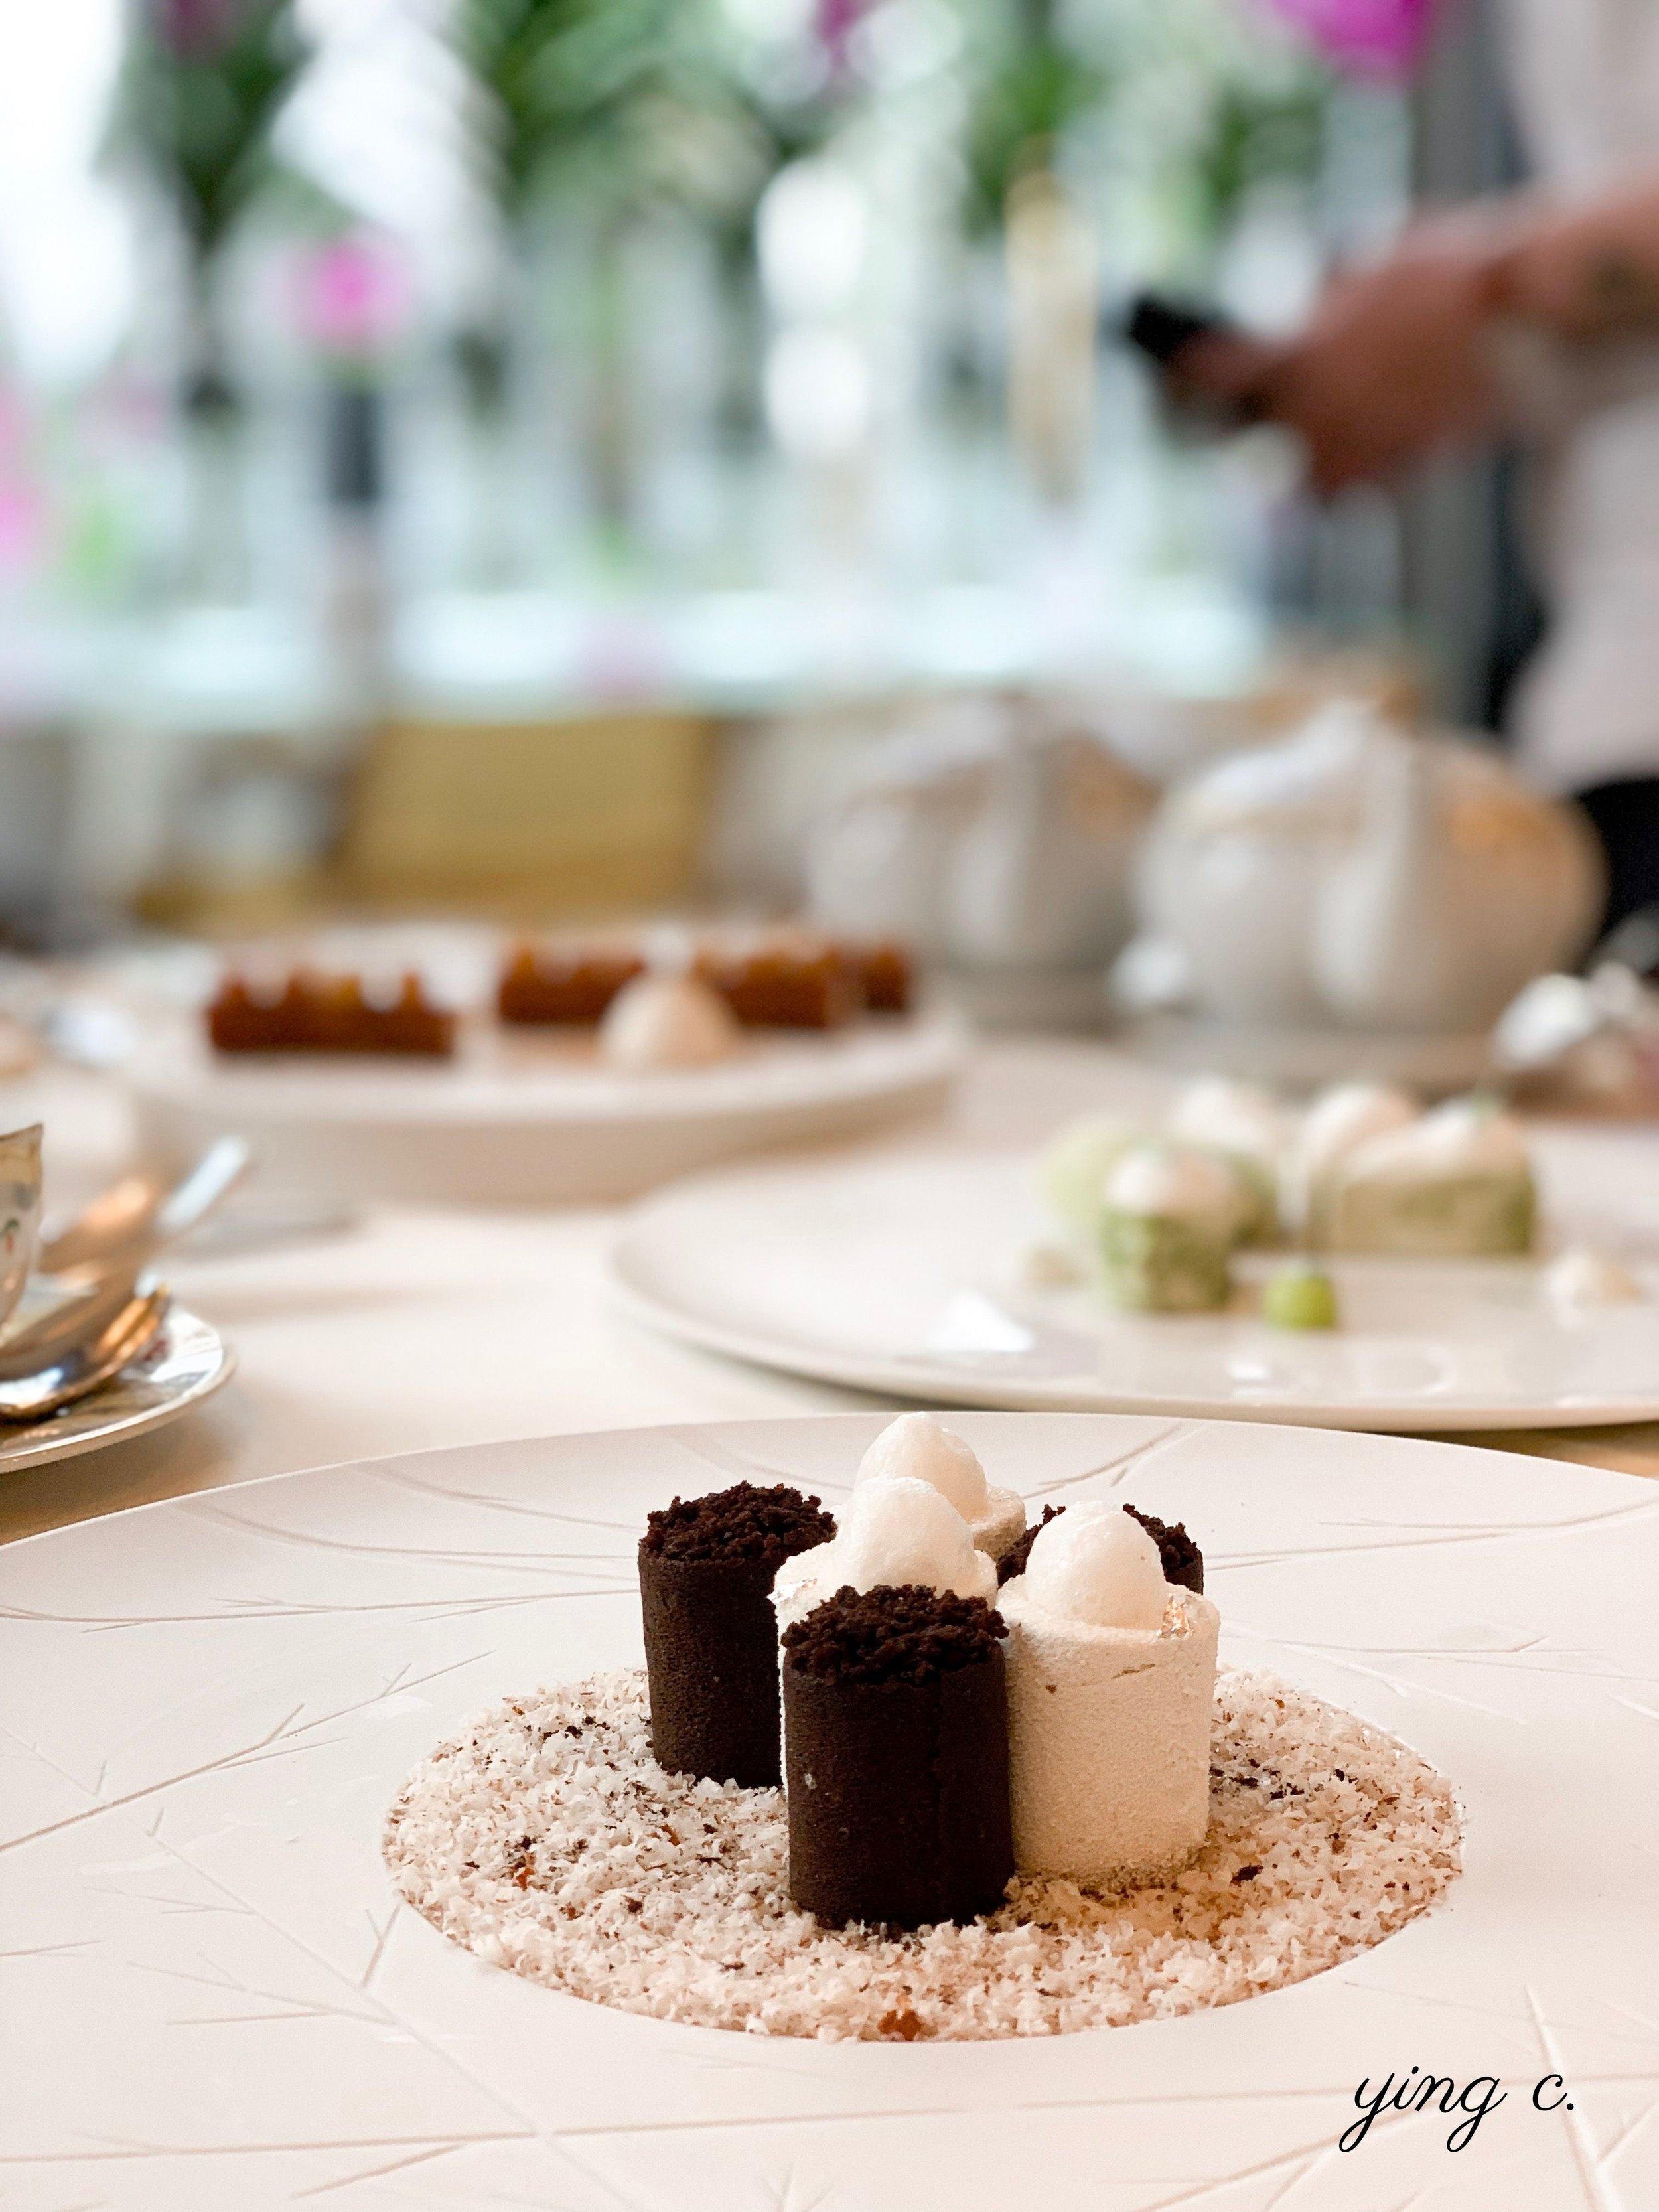 Maxime 為 l'Orangerie 設計的甜點「Croustillant de Vanille, Céréales Maltées」(酥脆大溪地香草、麥芽發酵穀物)。